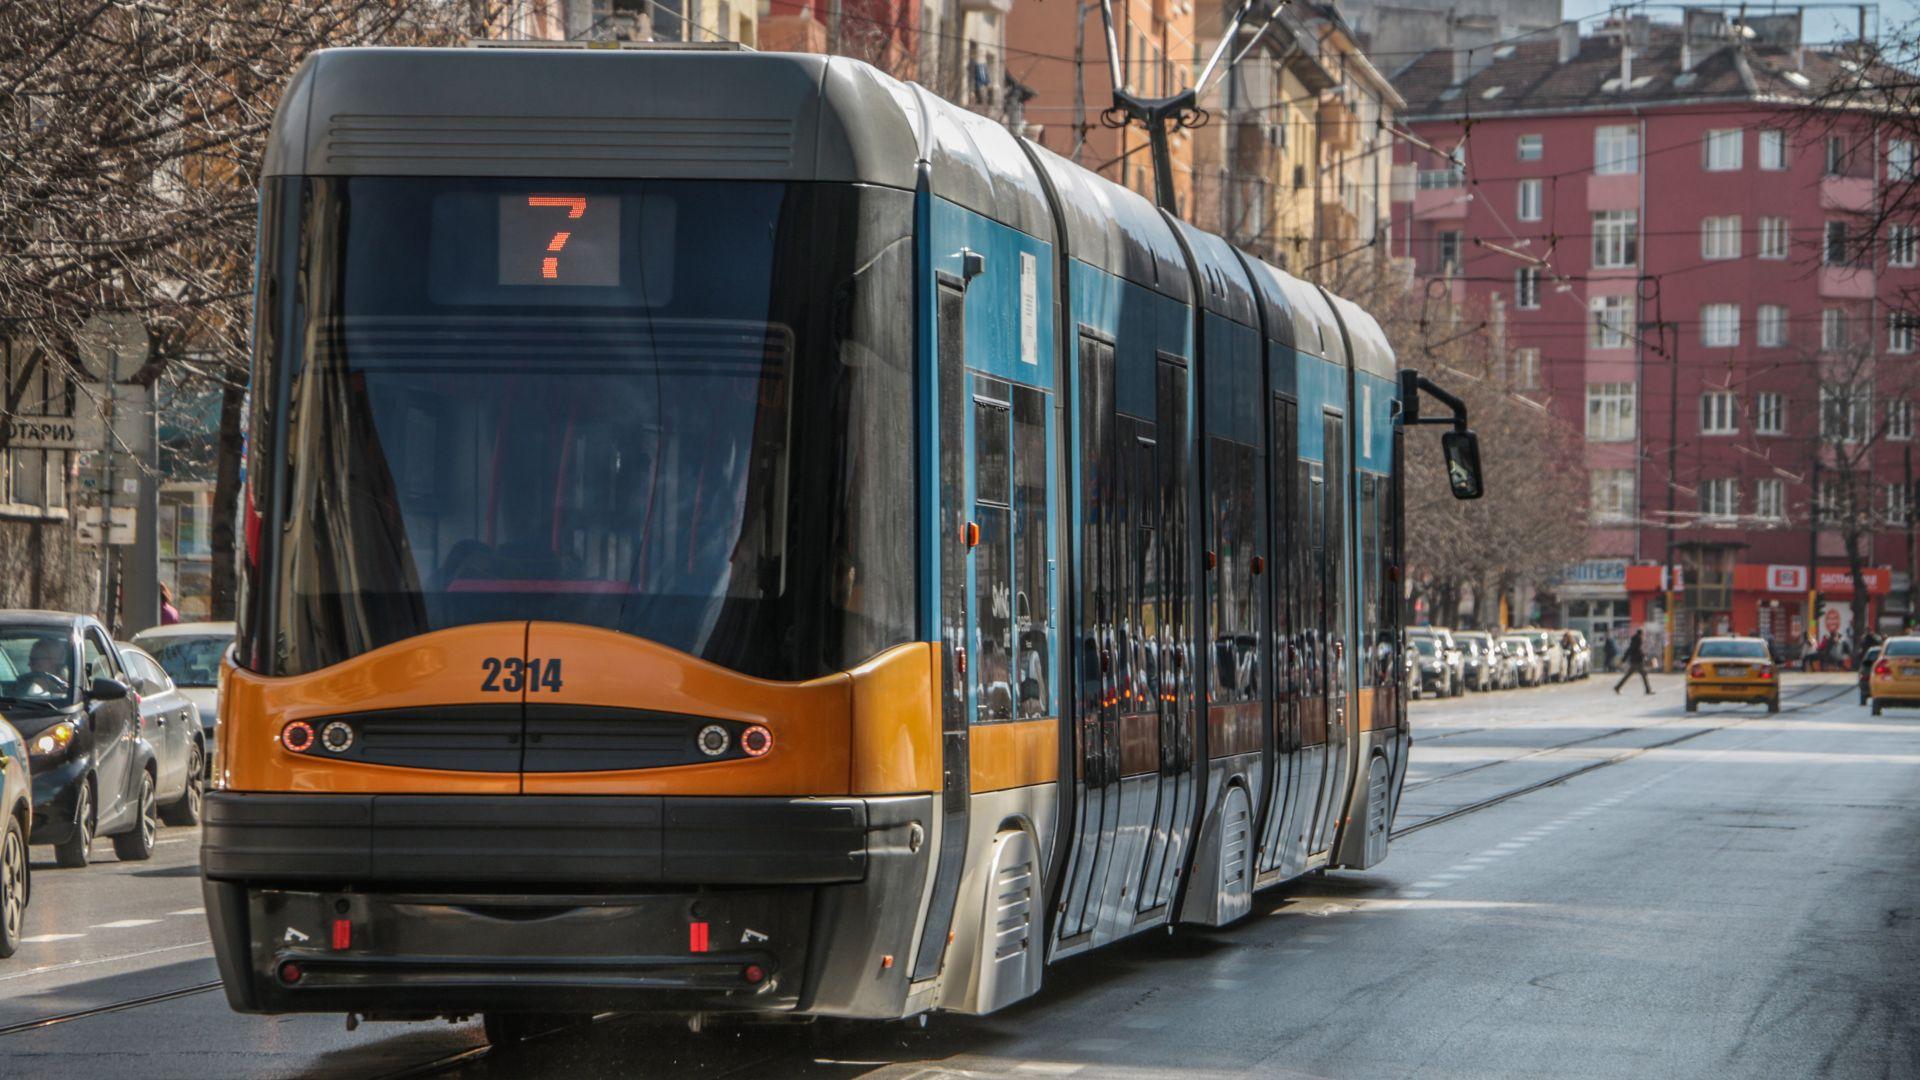 София купува 13 нови трамваи за над 40 млн. лева